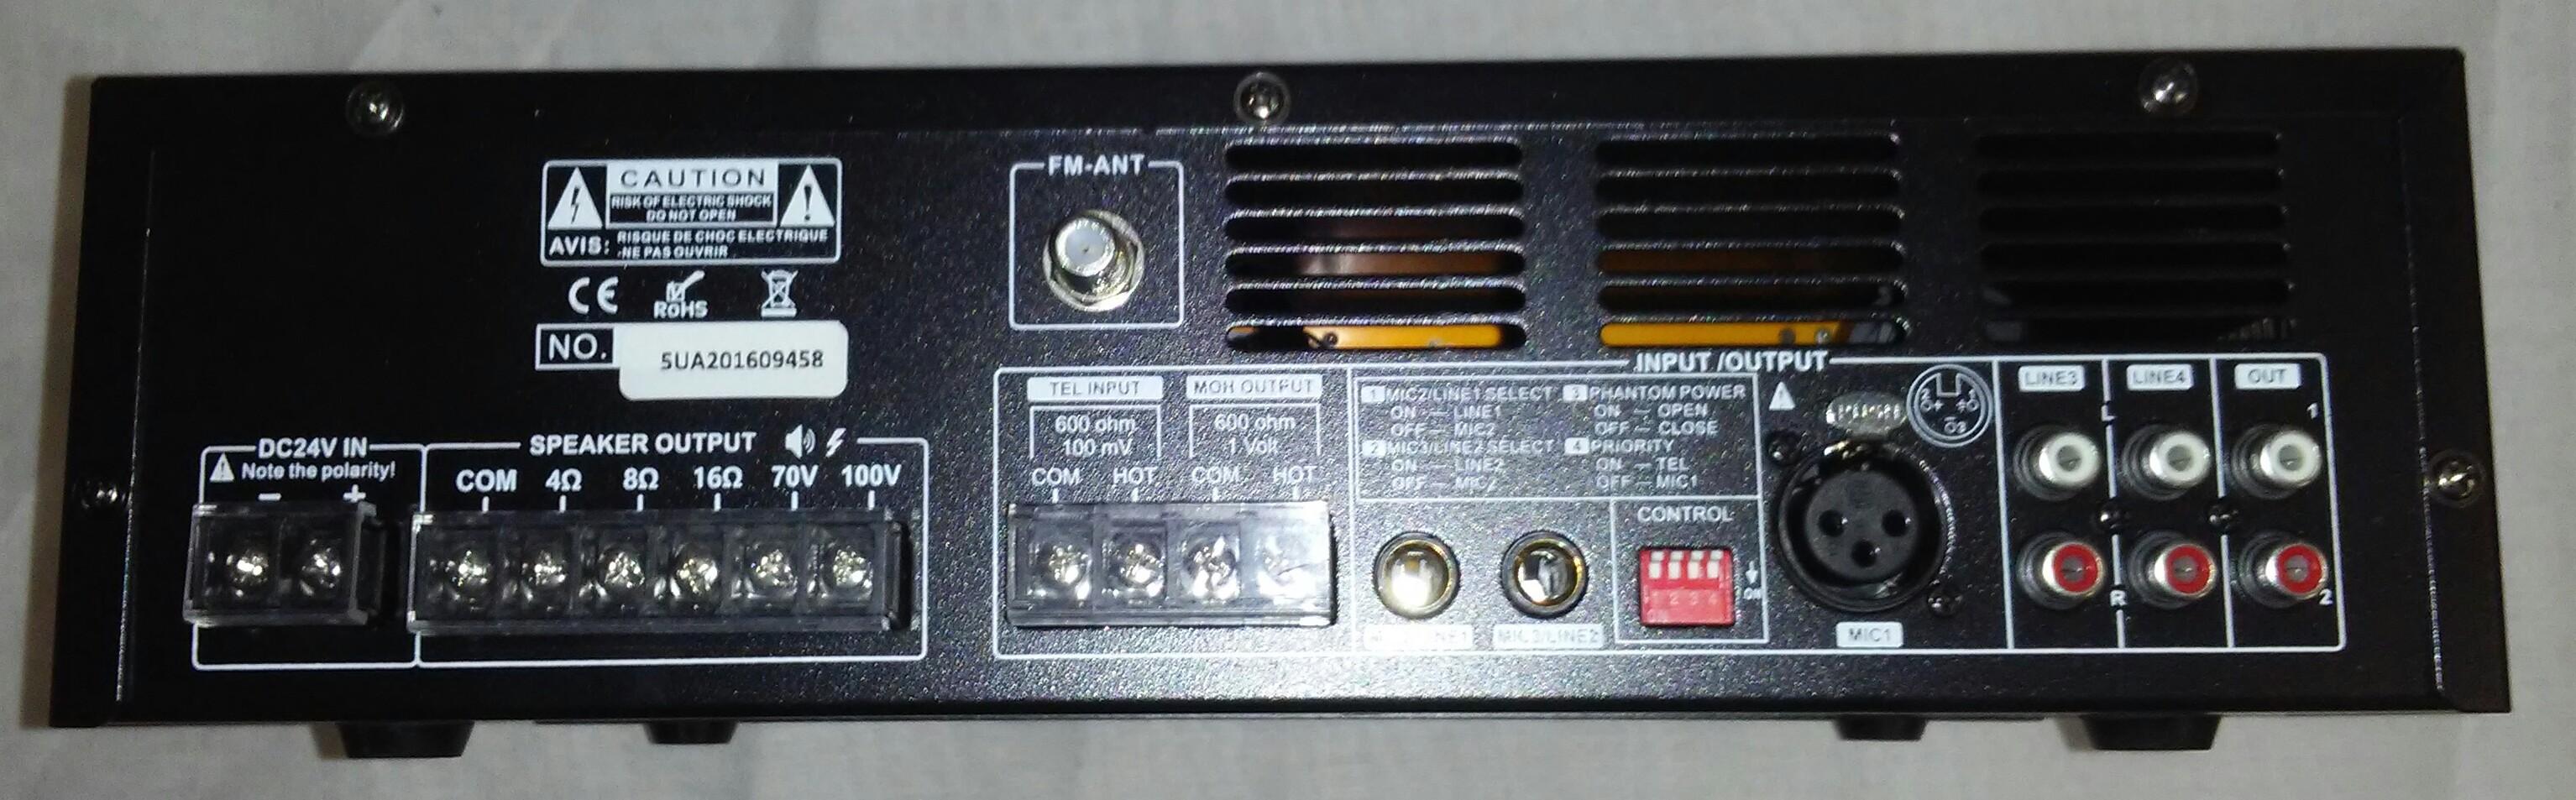 PA120R   120 Watt PA Mixer-Amplifier with FM/USB-SD/Bluetooth